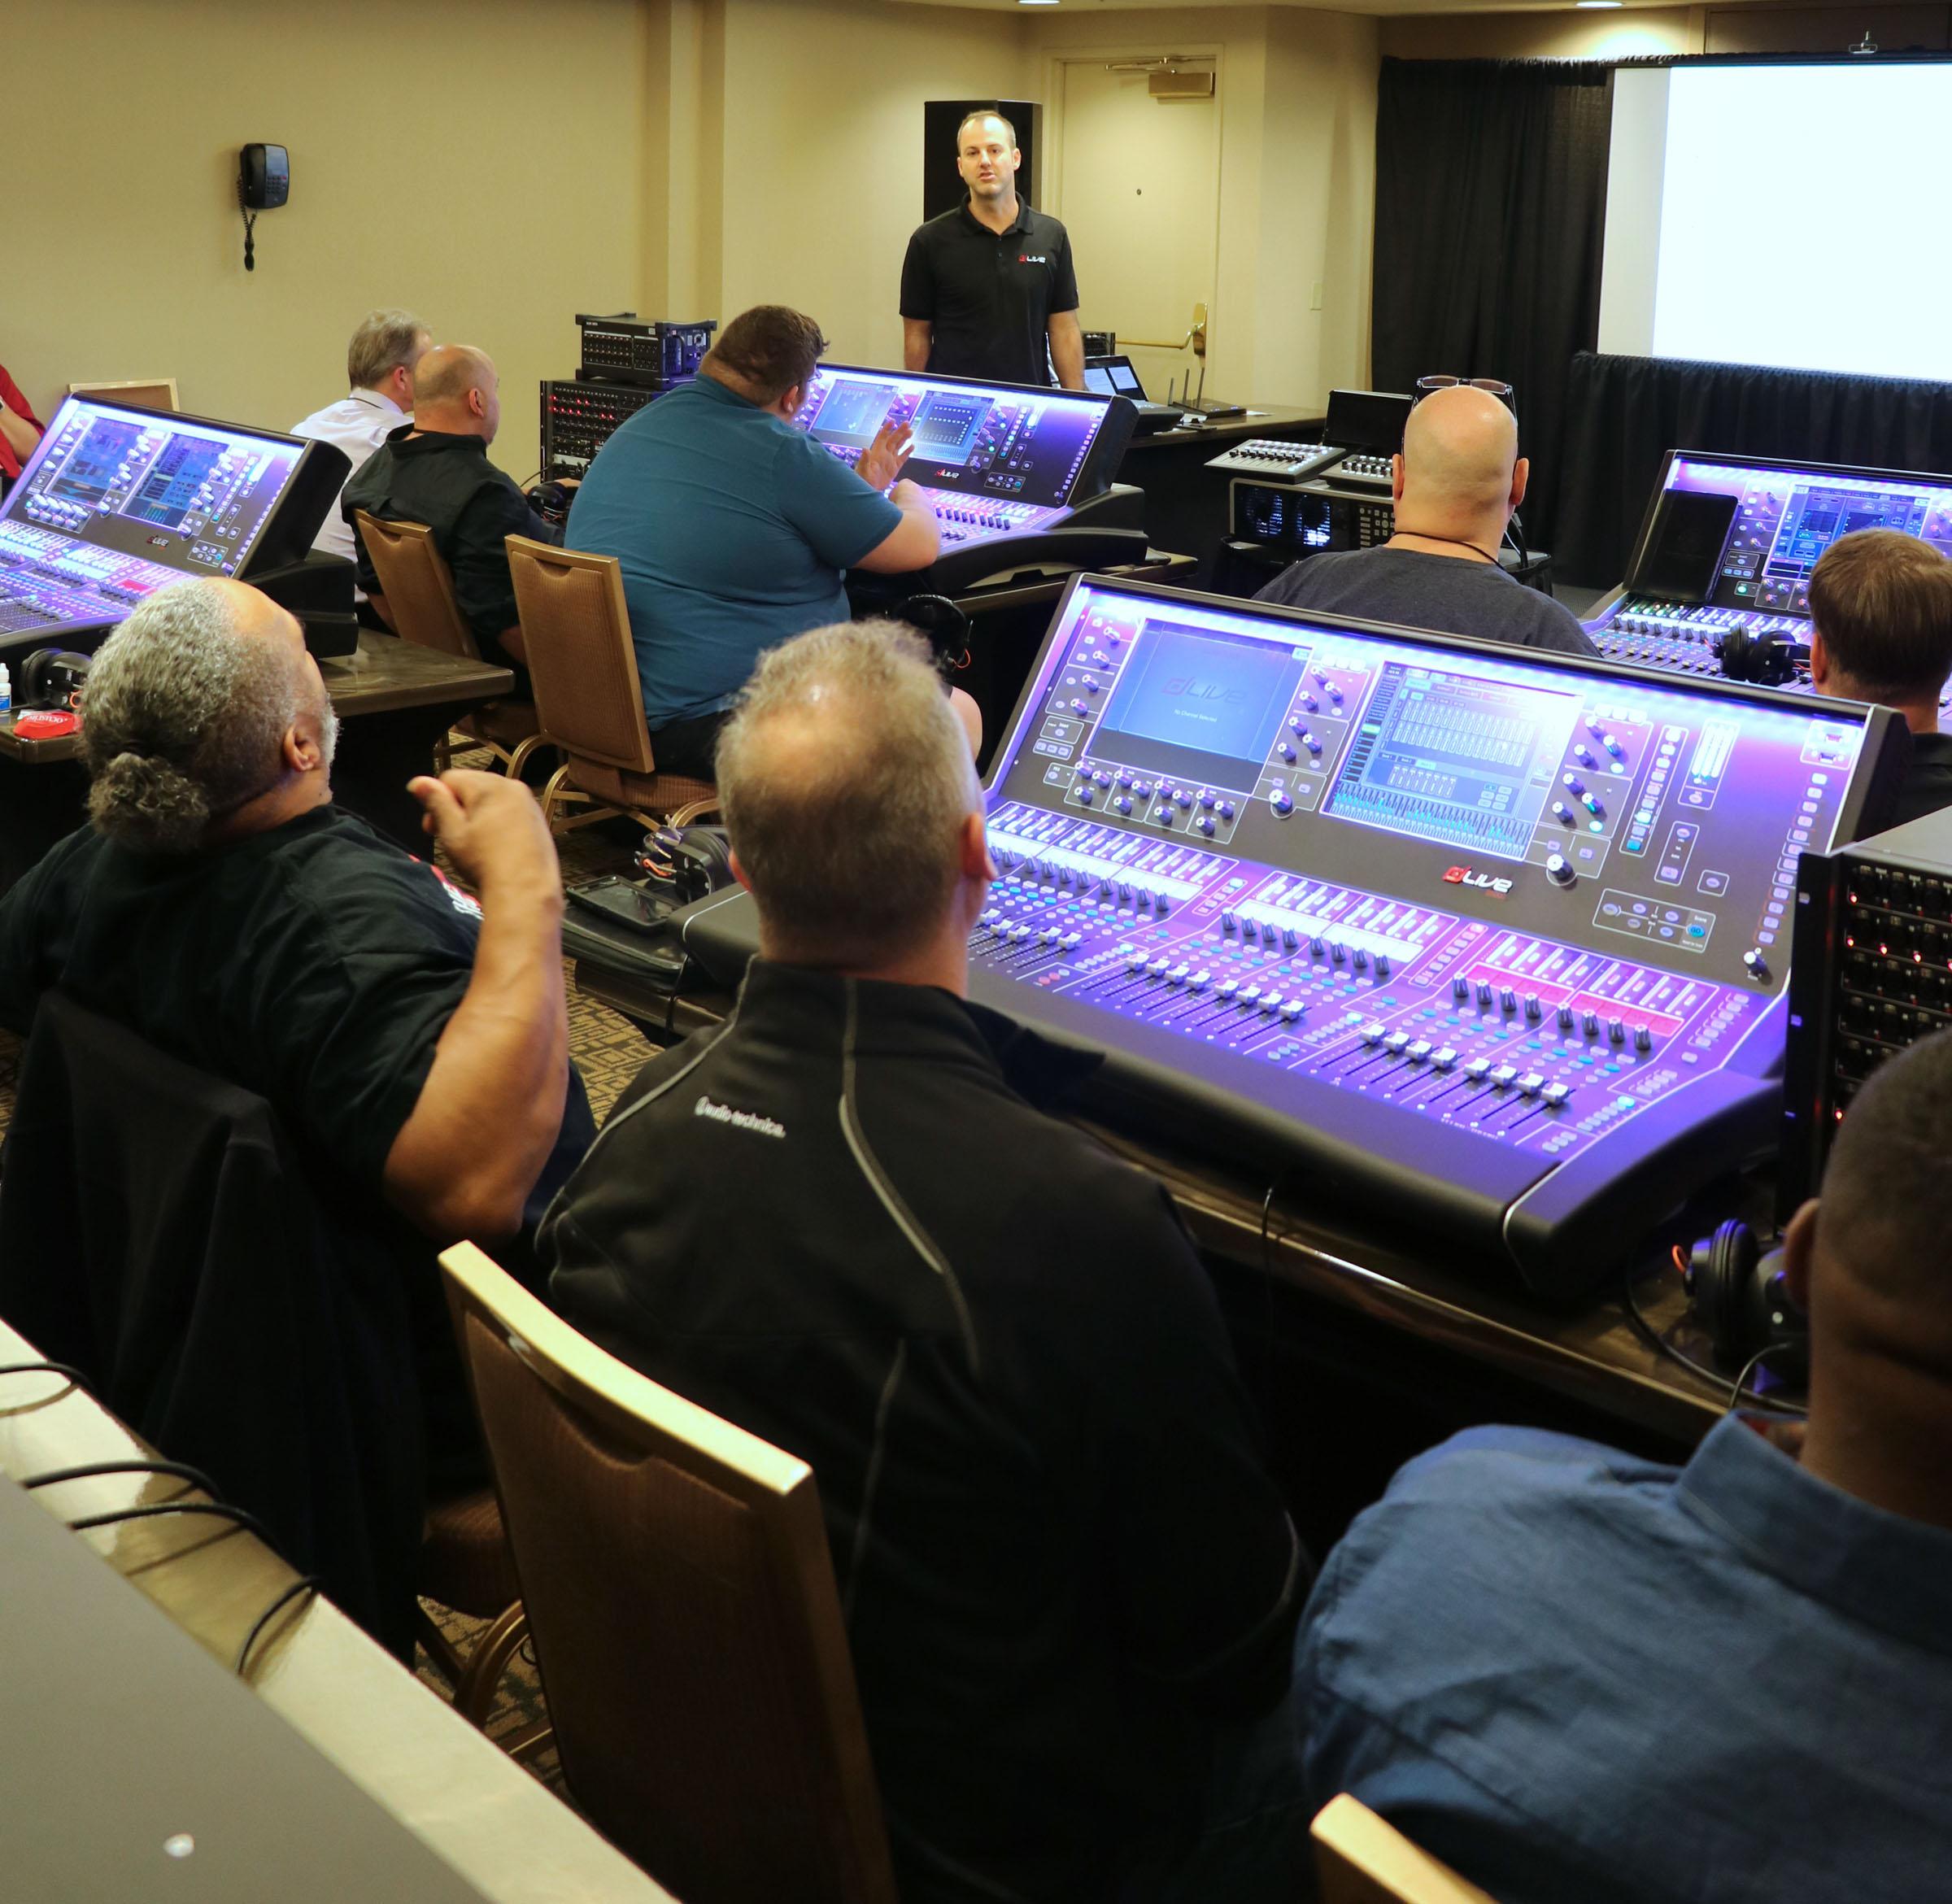 AES Press Release » AES@NAMM Pro Sound Symposium: Live